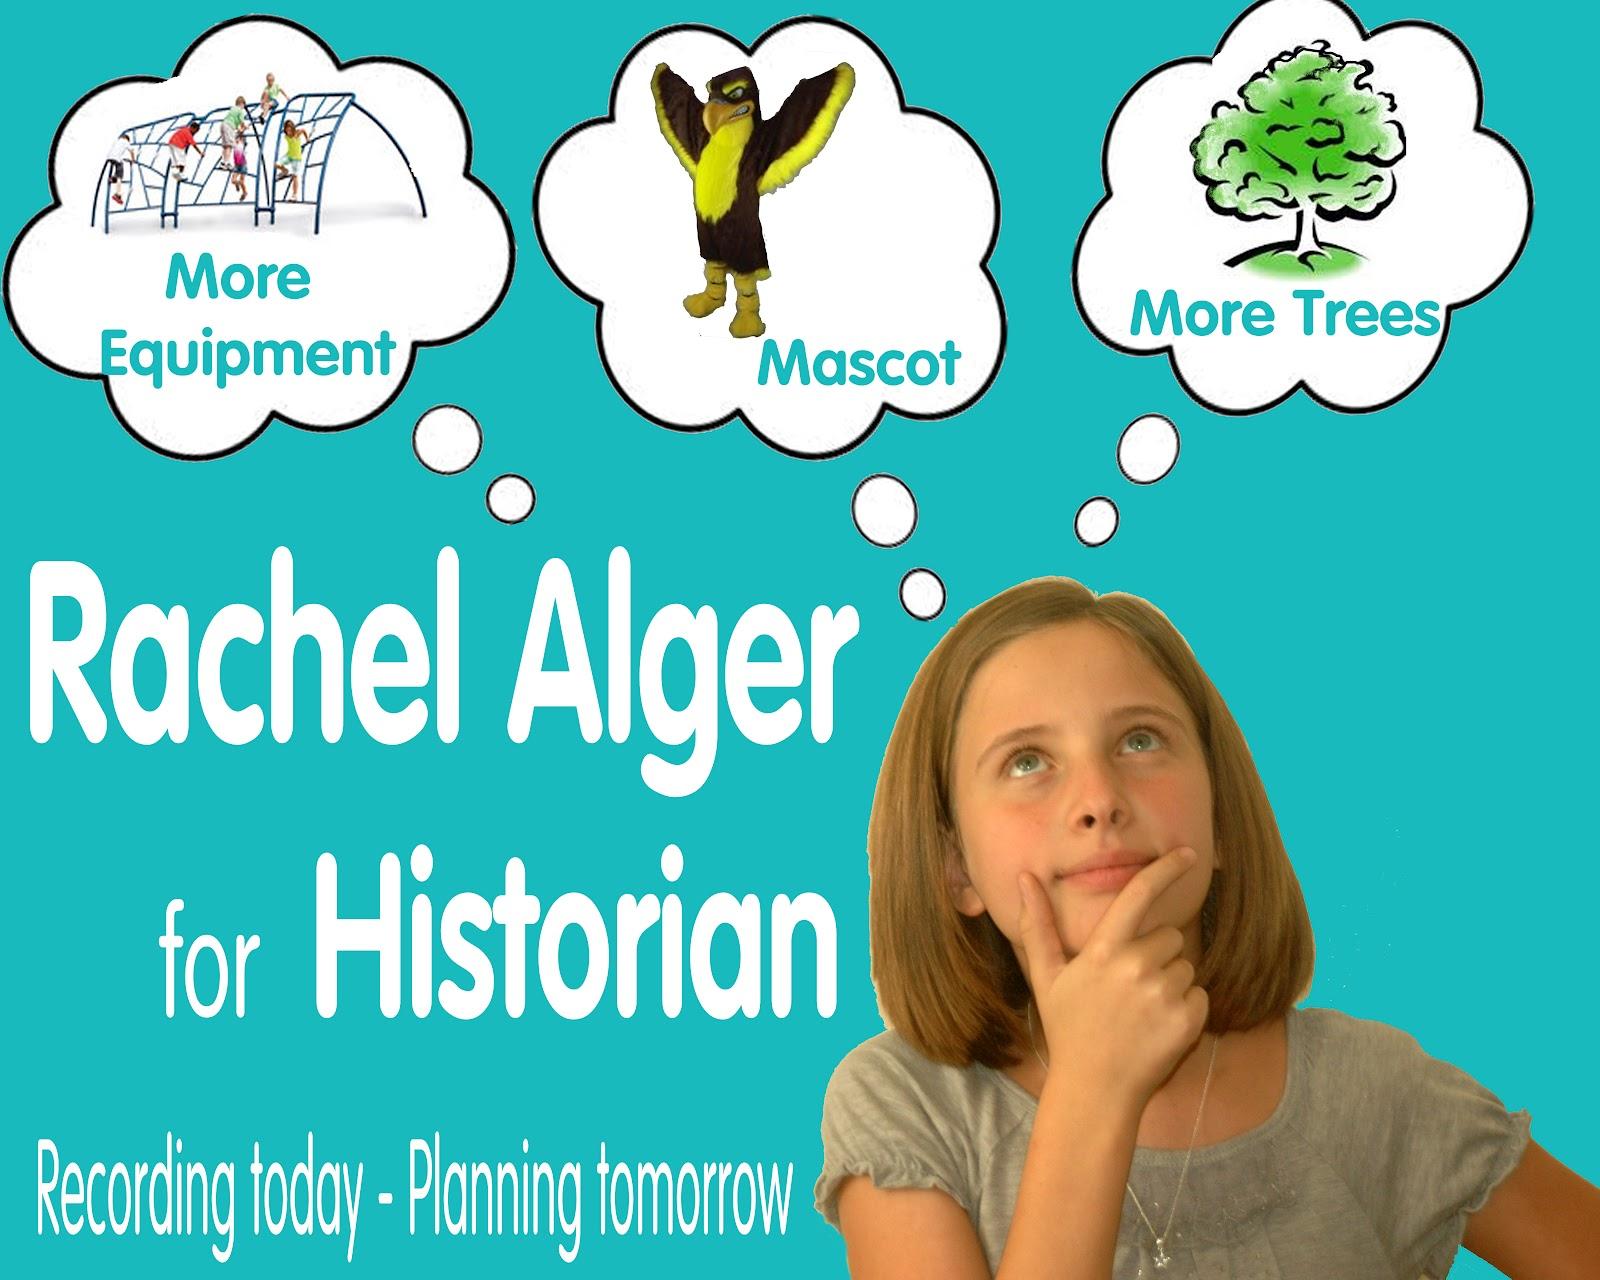 Poster Run For School Council Historian